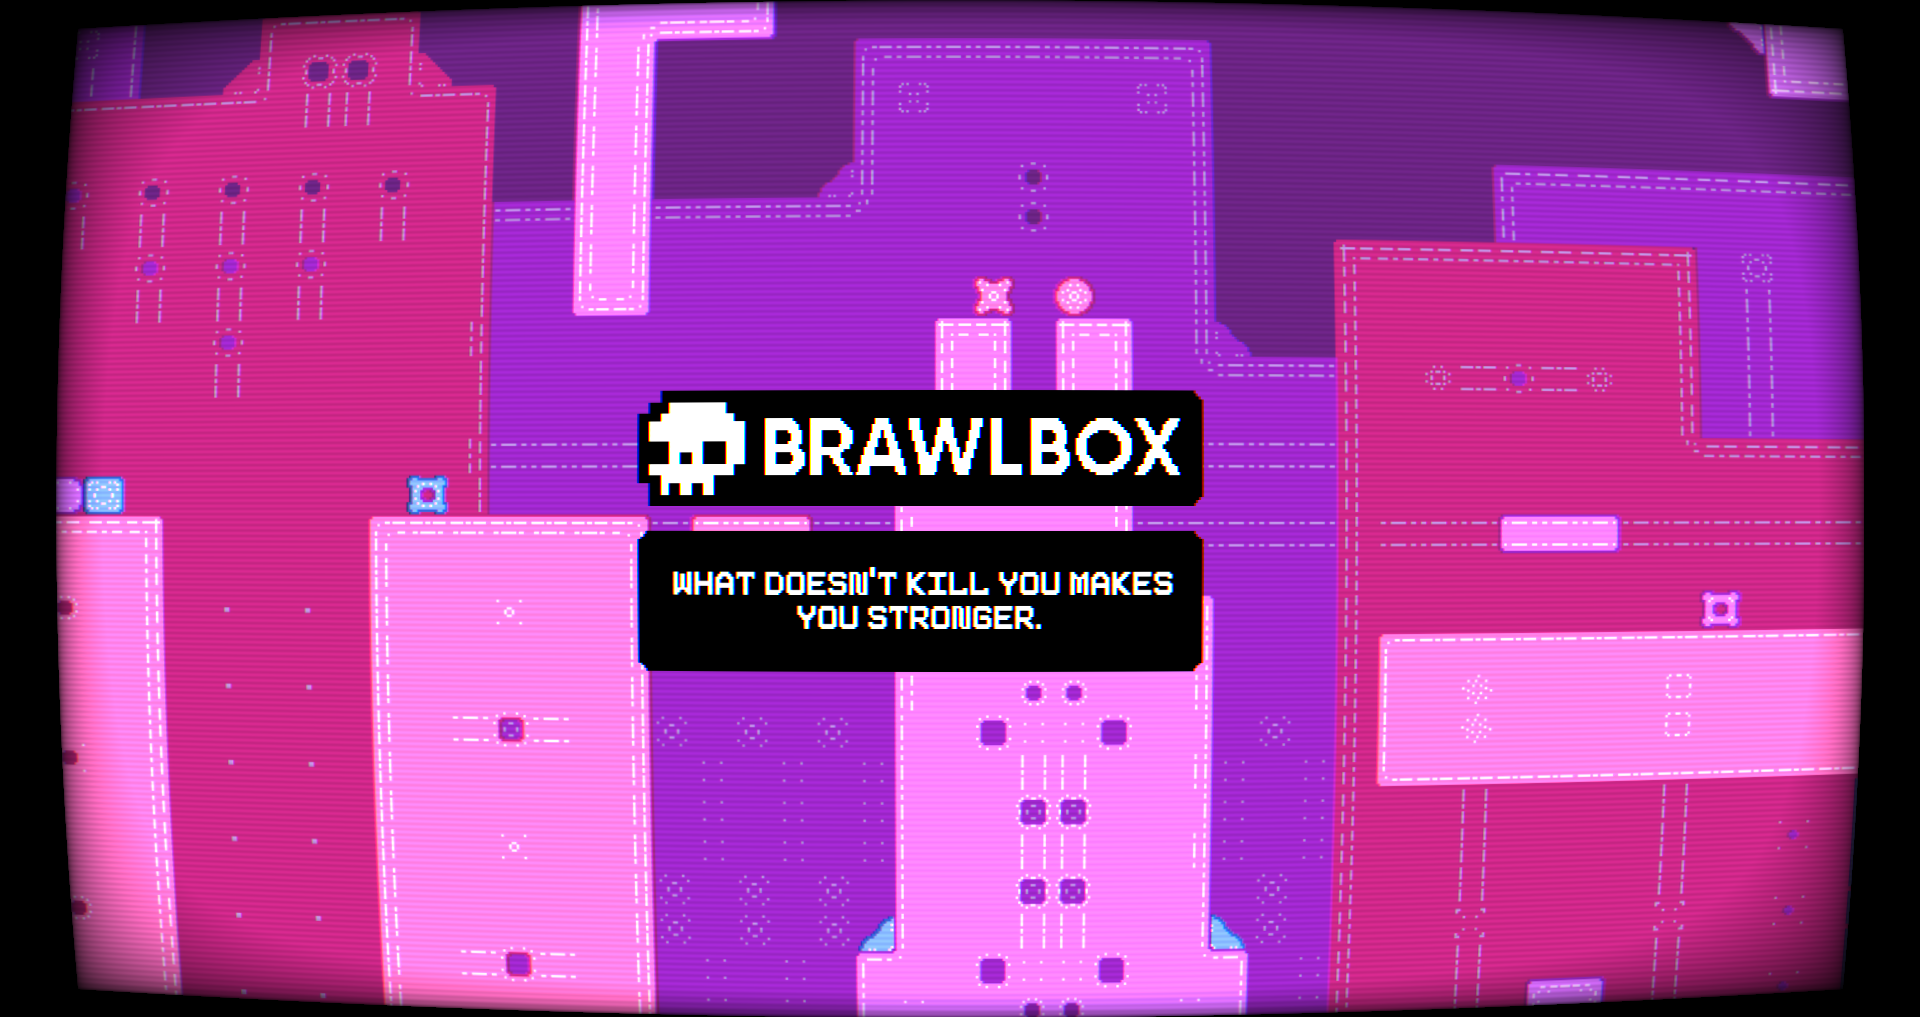 BRAWLBOX